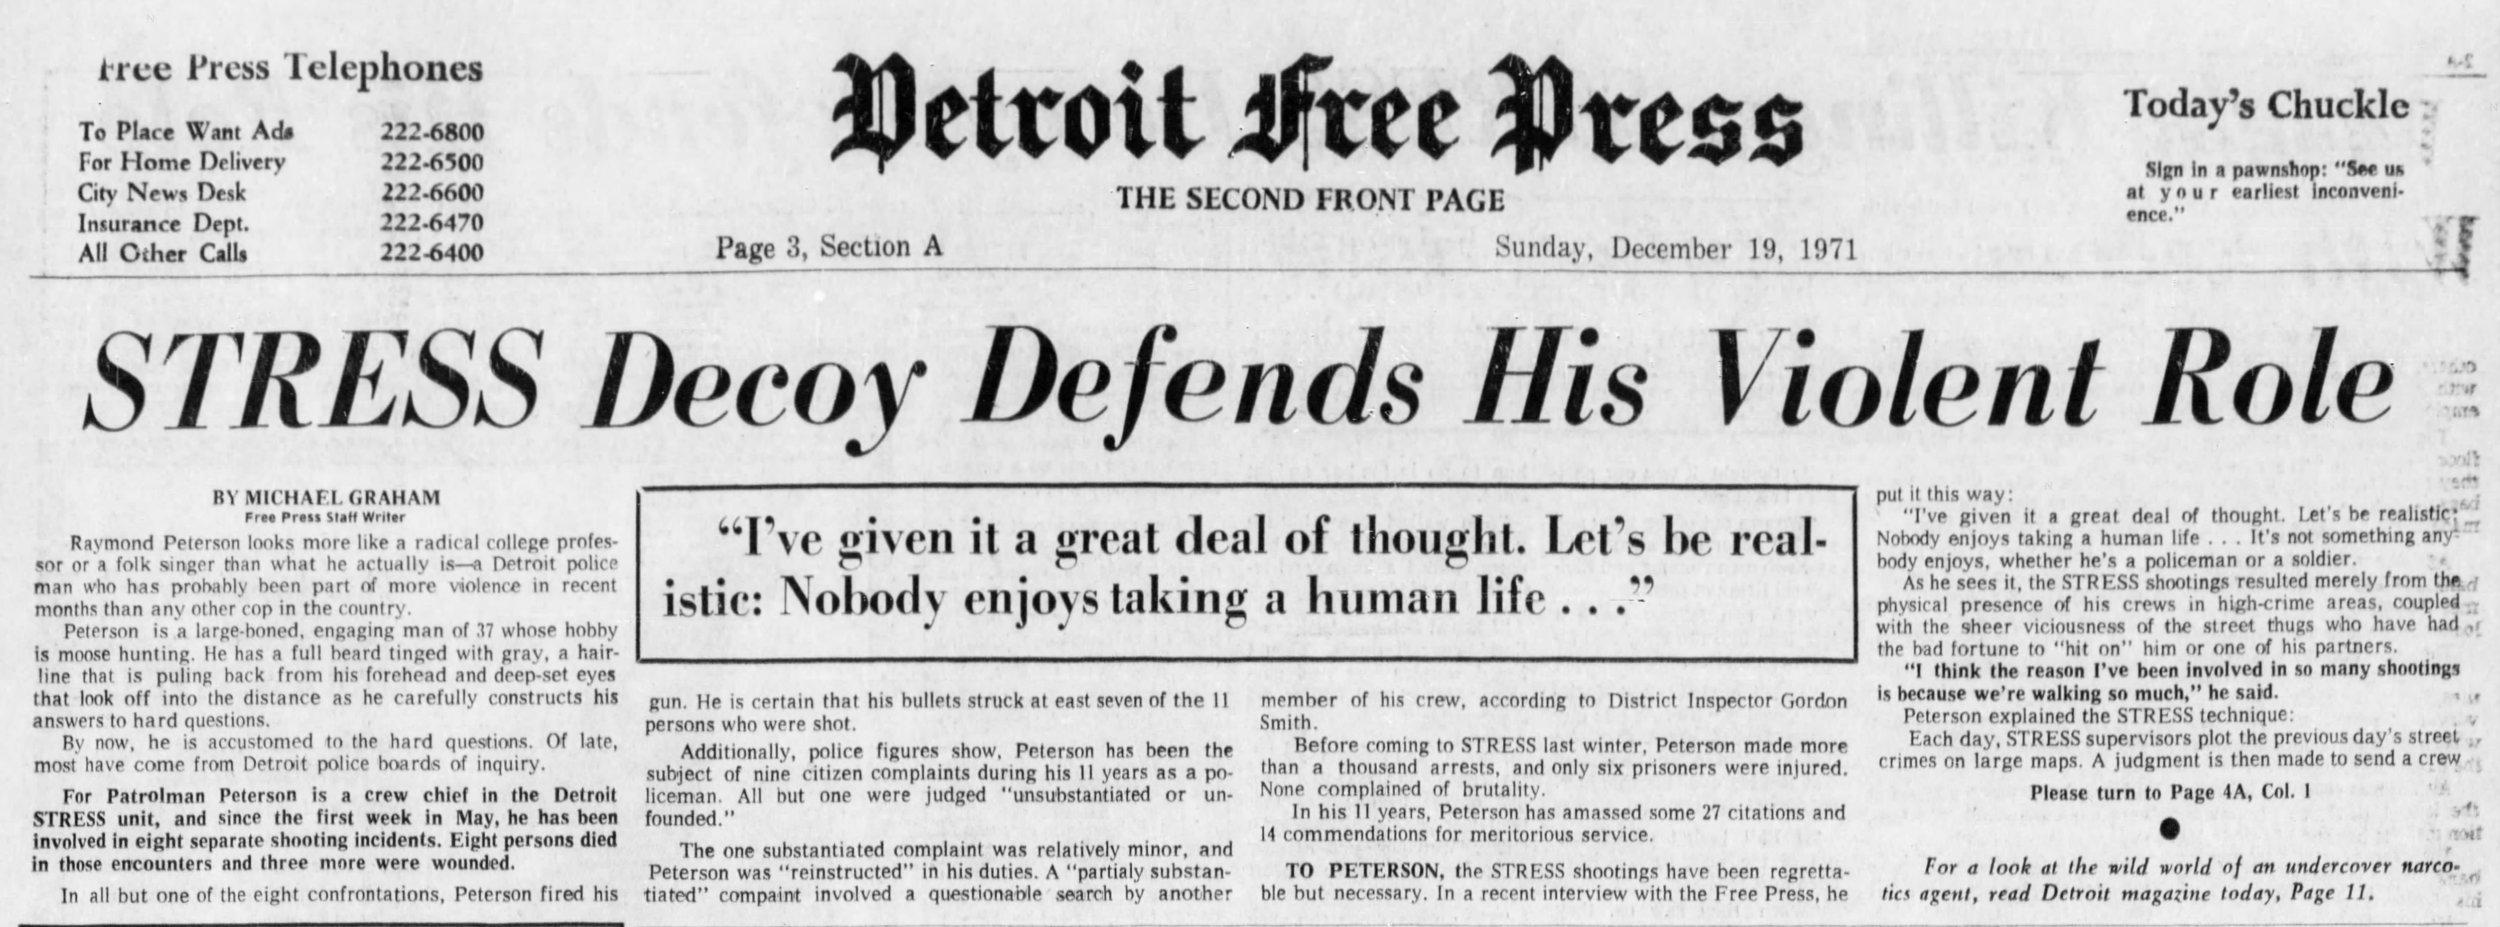 1971_12_19_STRESS Decoy Defends His Violent Role_DFP.jpg